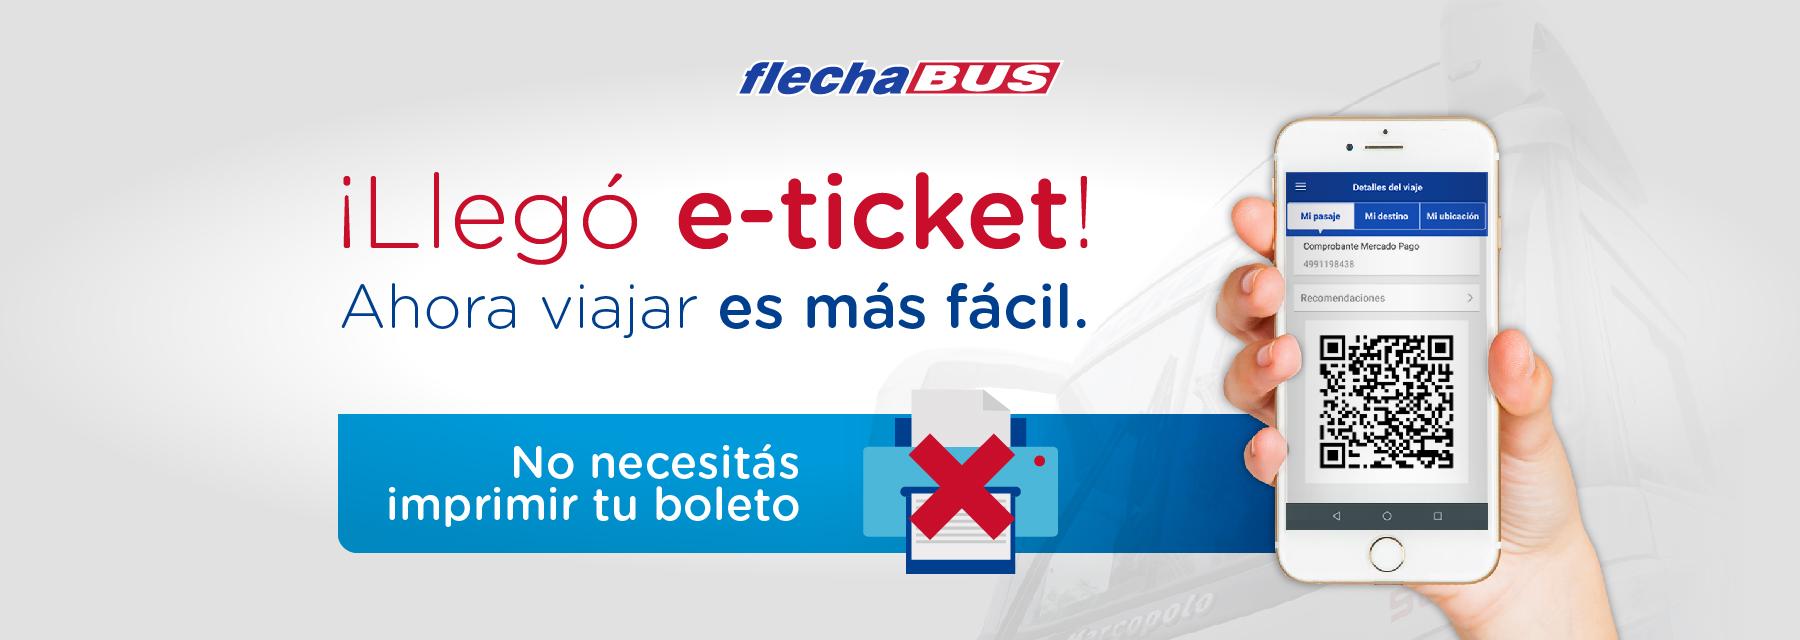 e-ticket_nw_header landing-flechabus